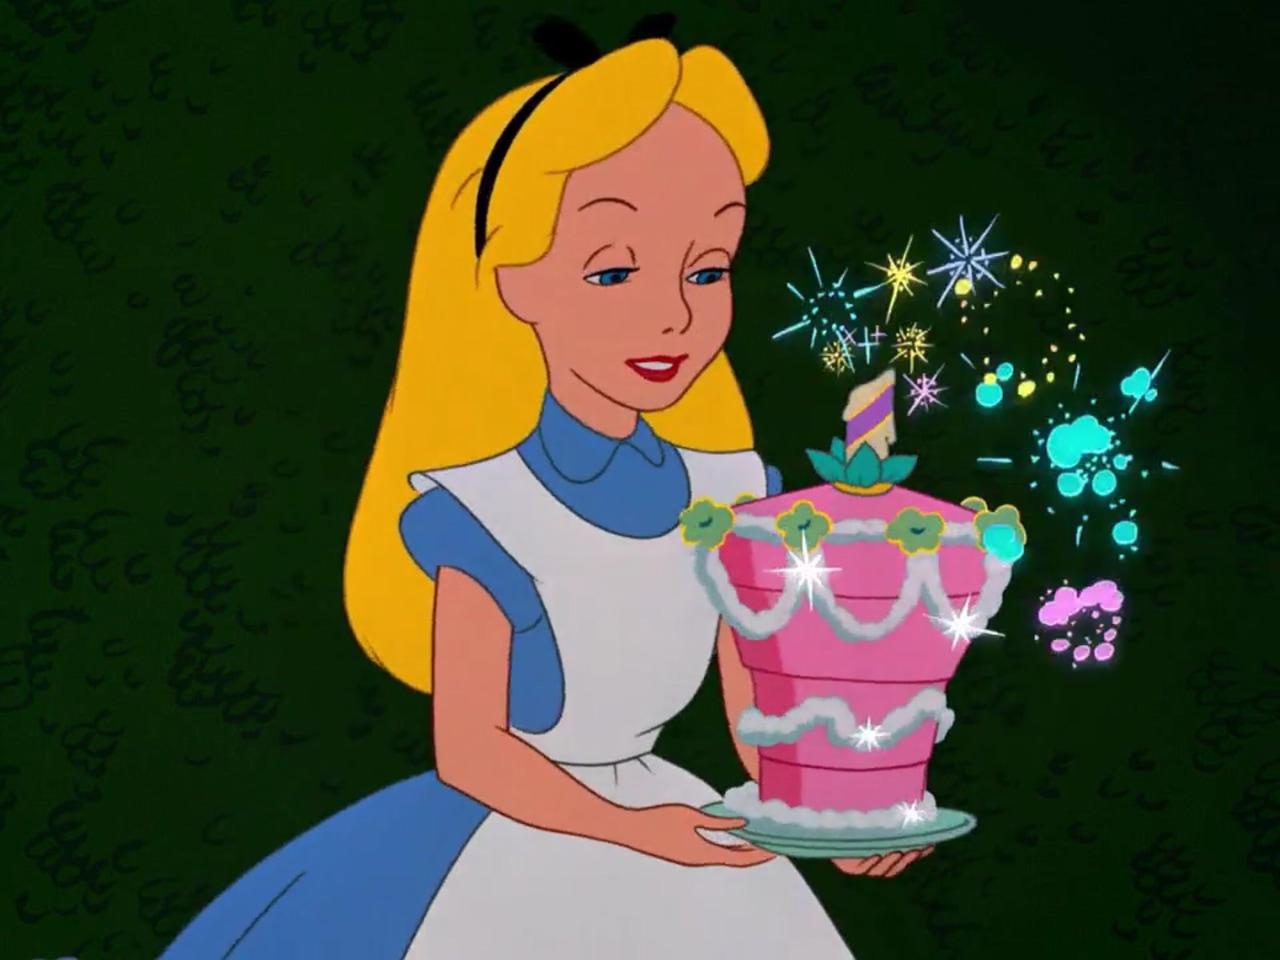 alice, alice in wonderland, and cake image